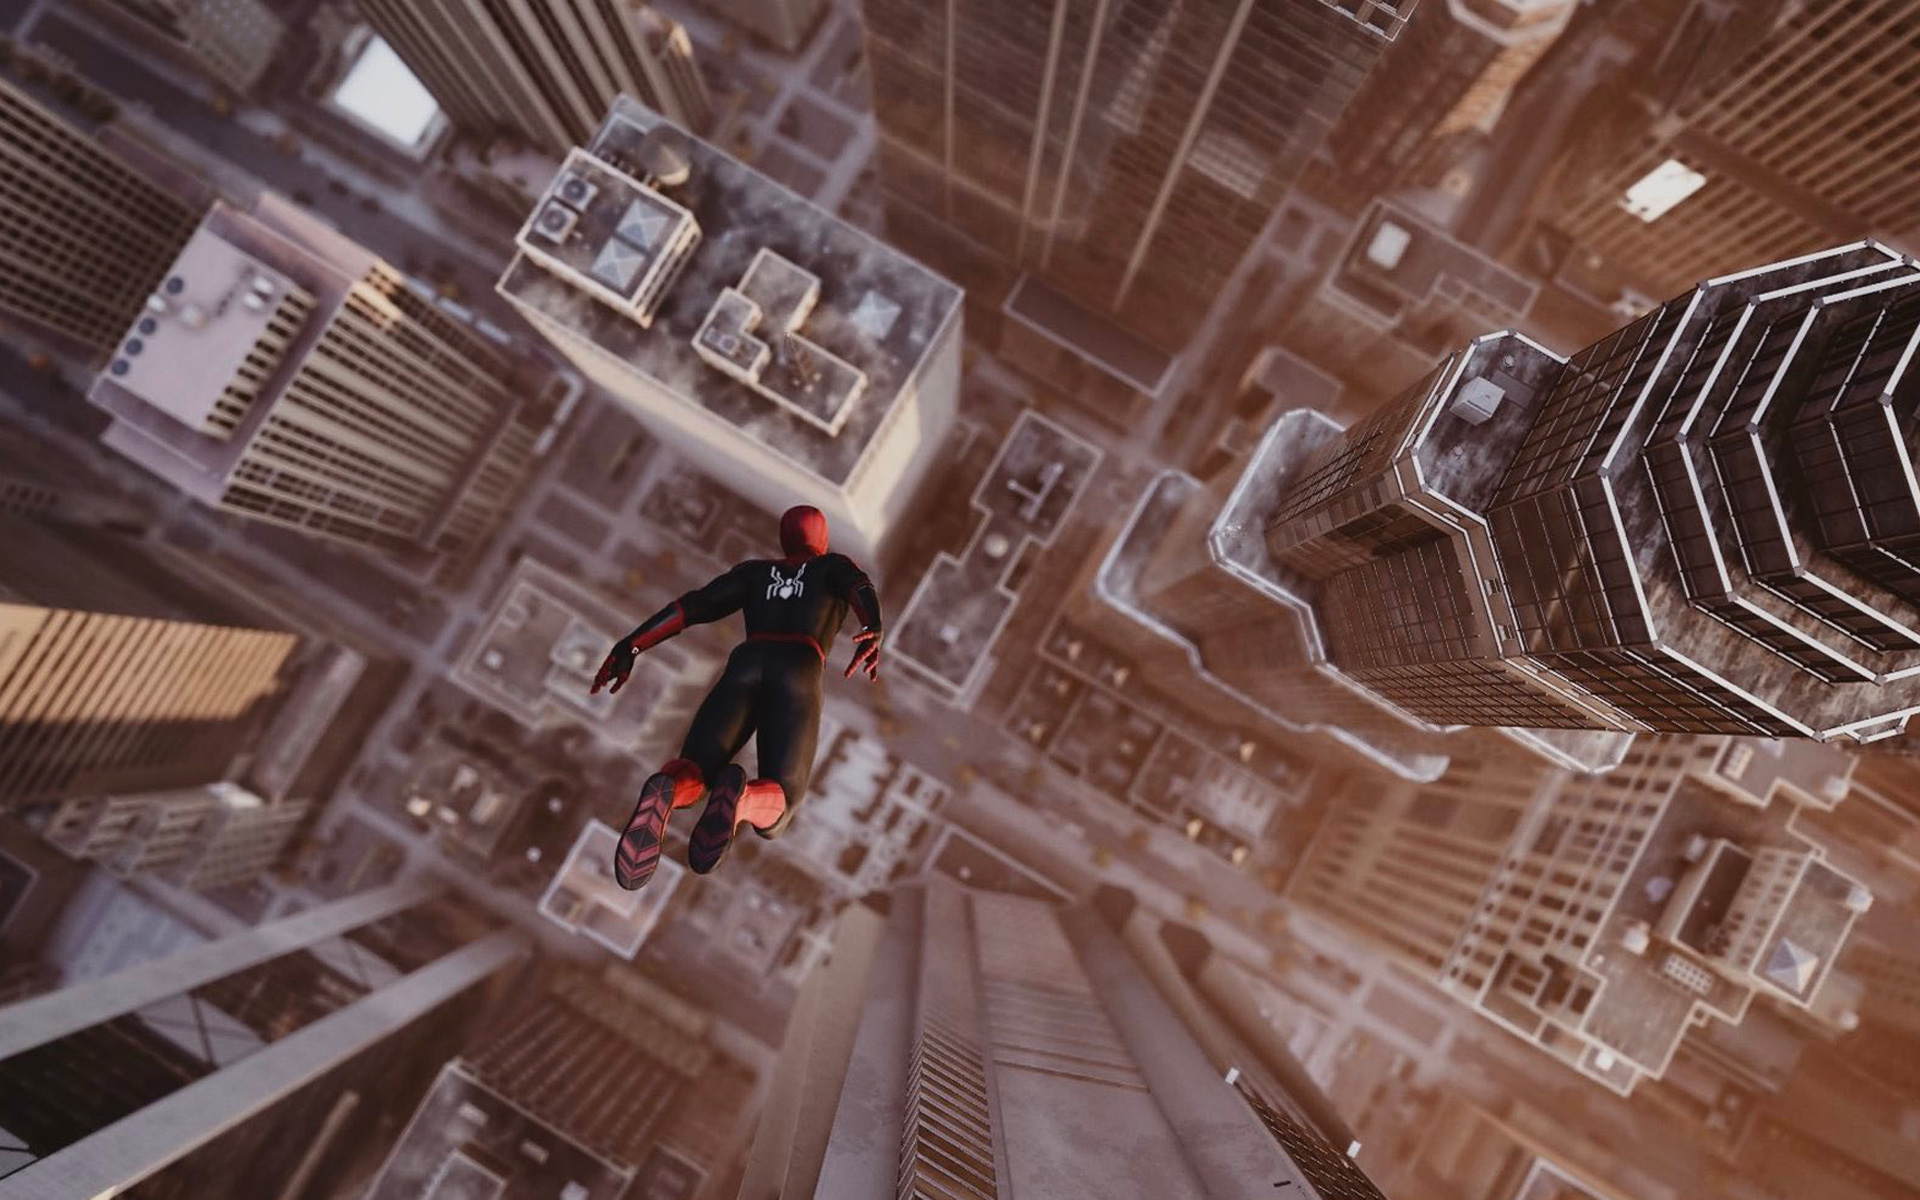 Free Spider-Man Wallpaper in 1920x1200